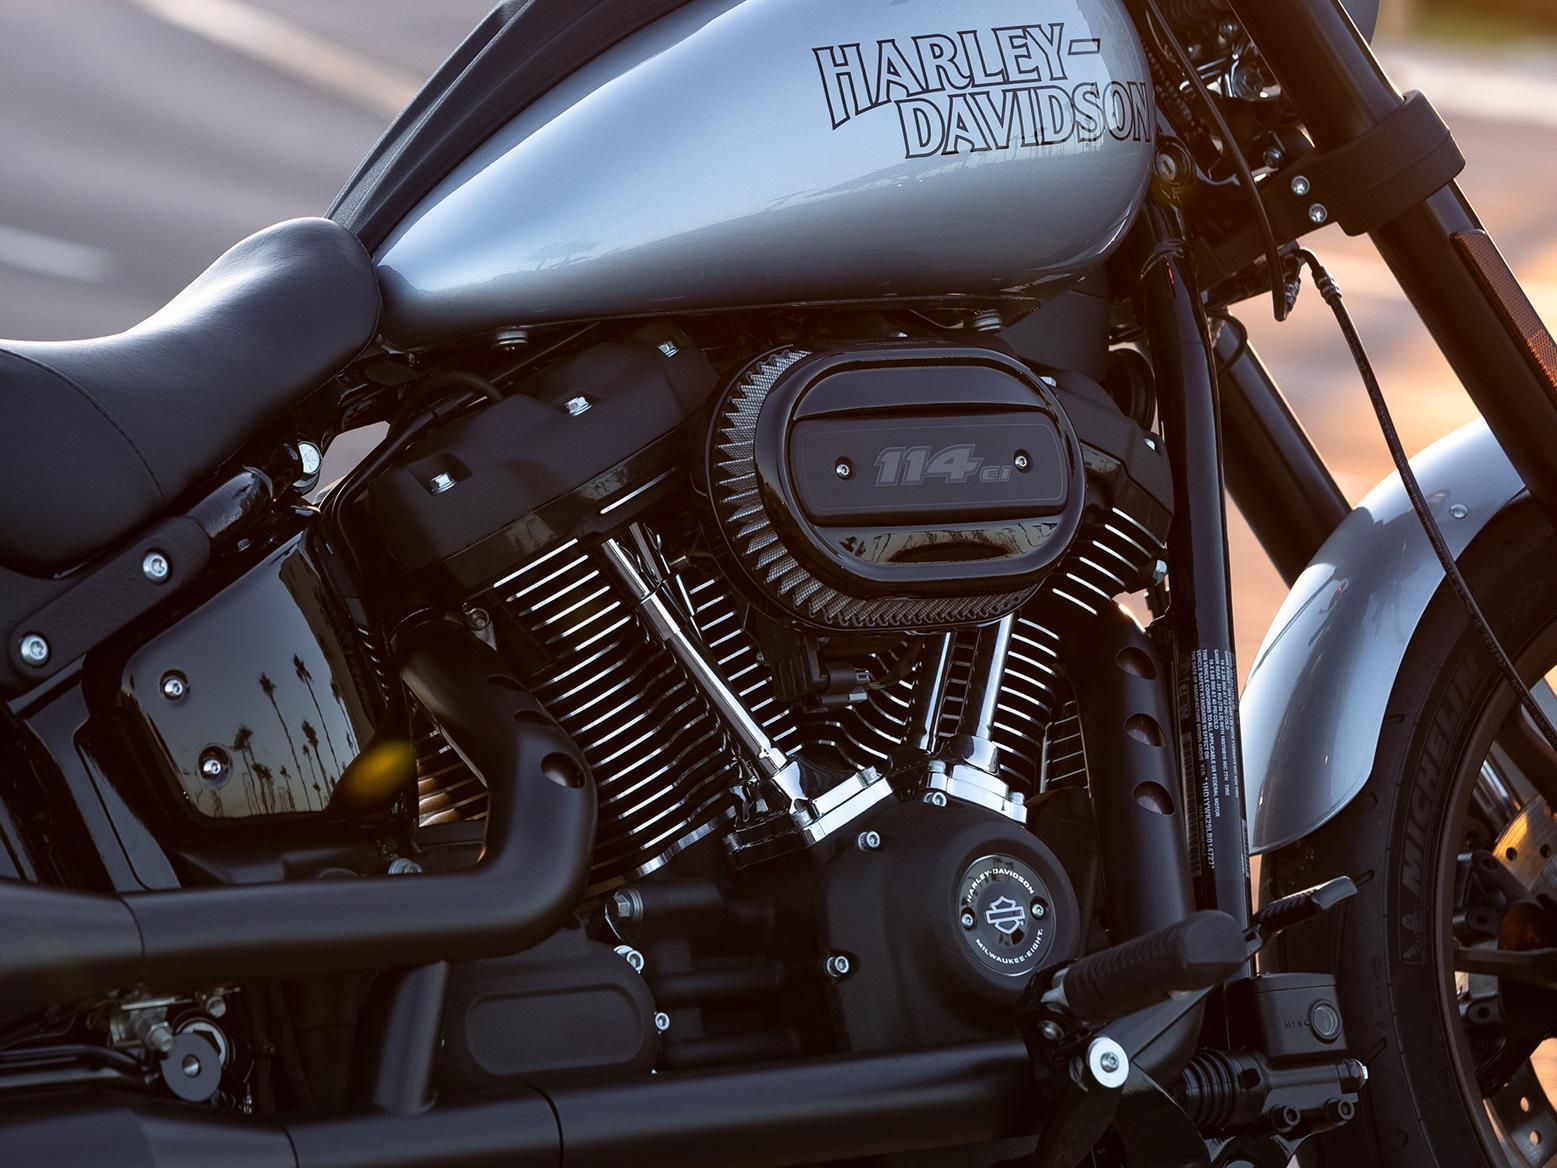 Harley-Davidson Lowrider S engine